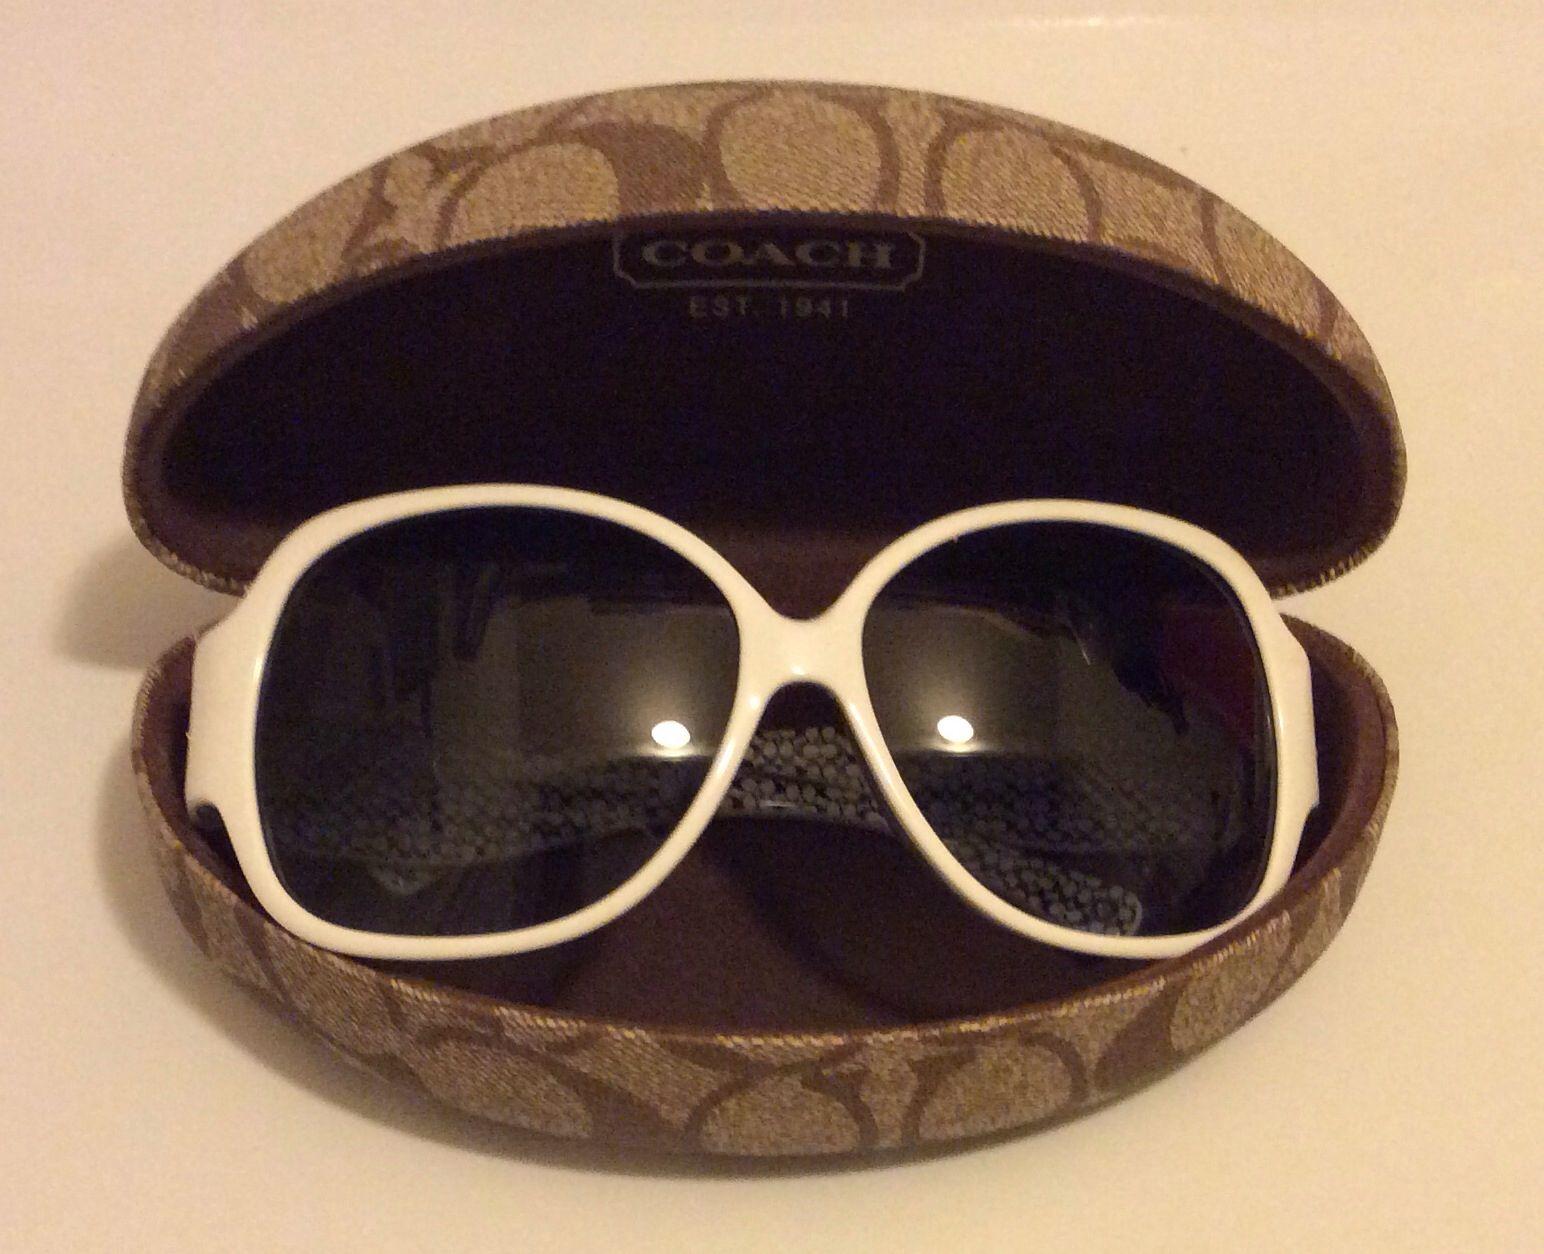 Coach white sunglasses. White sunglasses, Sunglasses